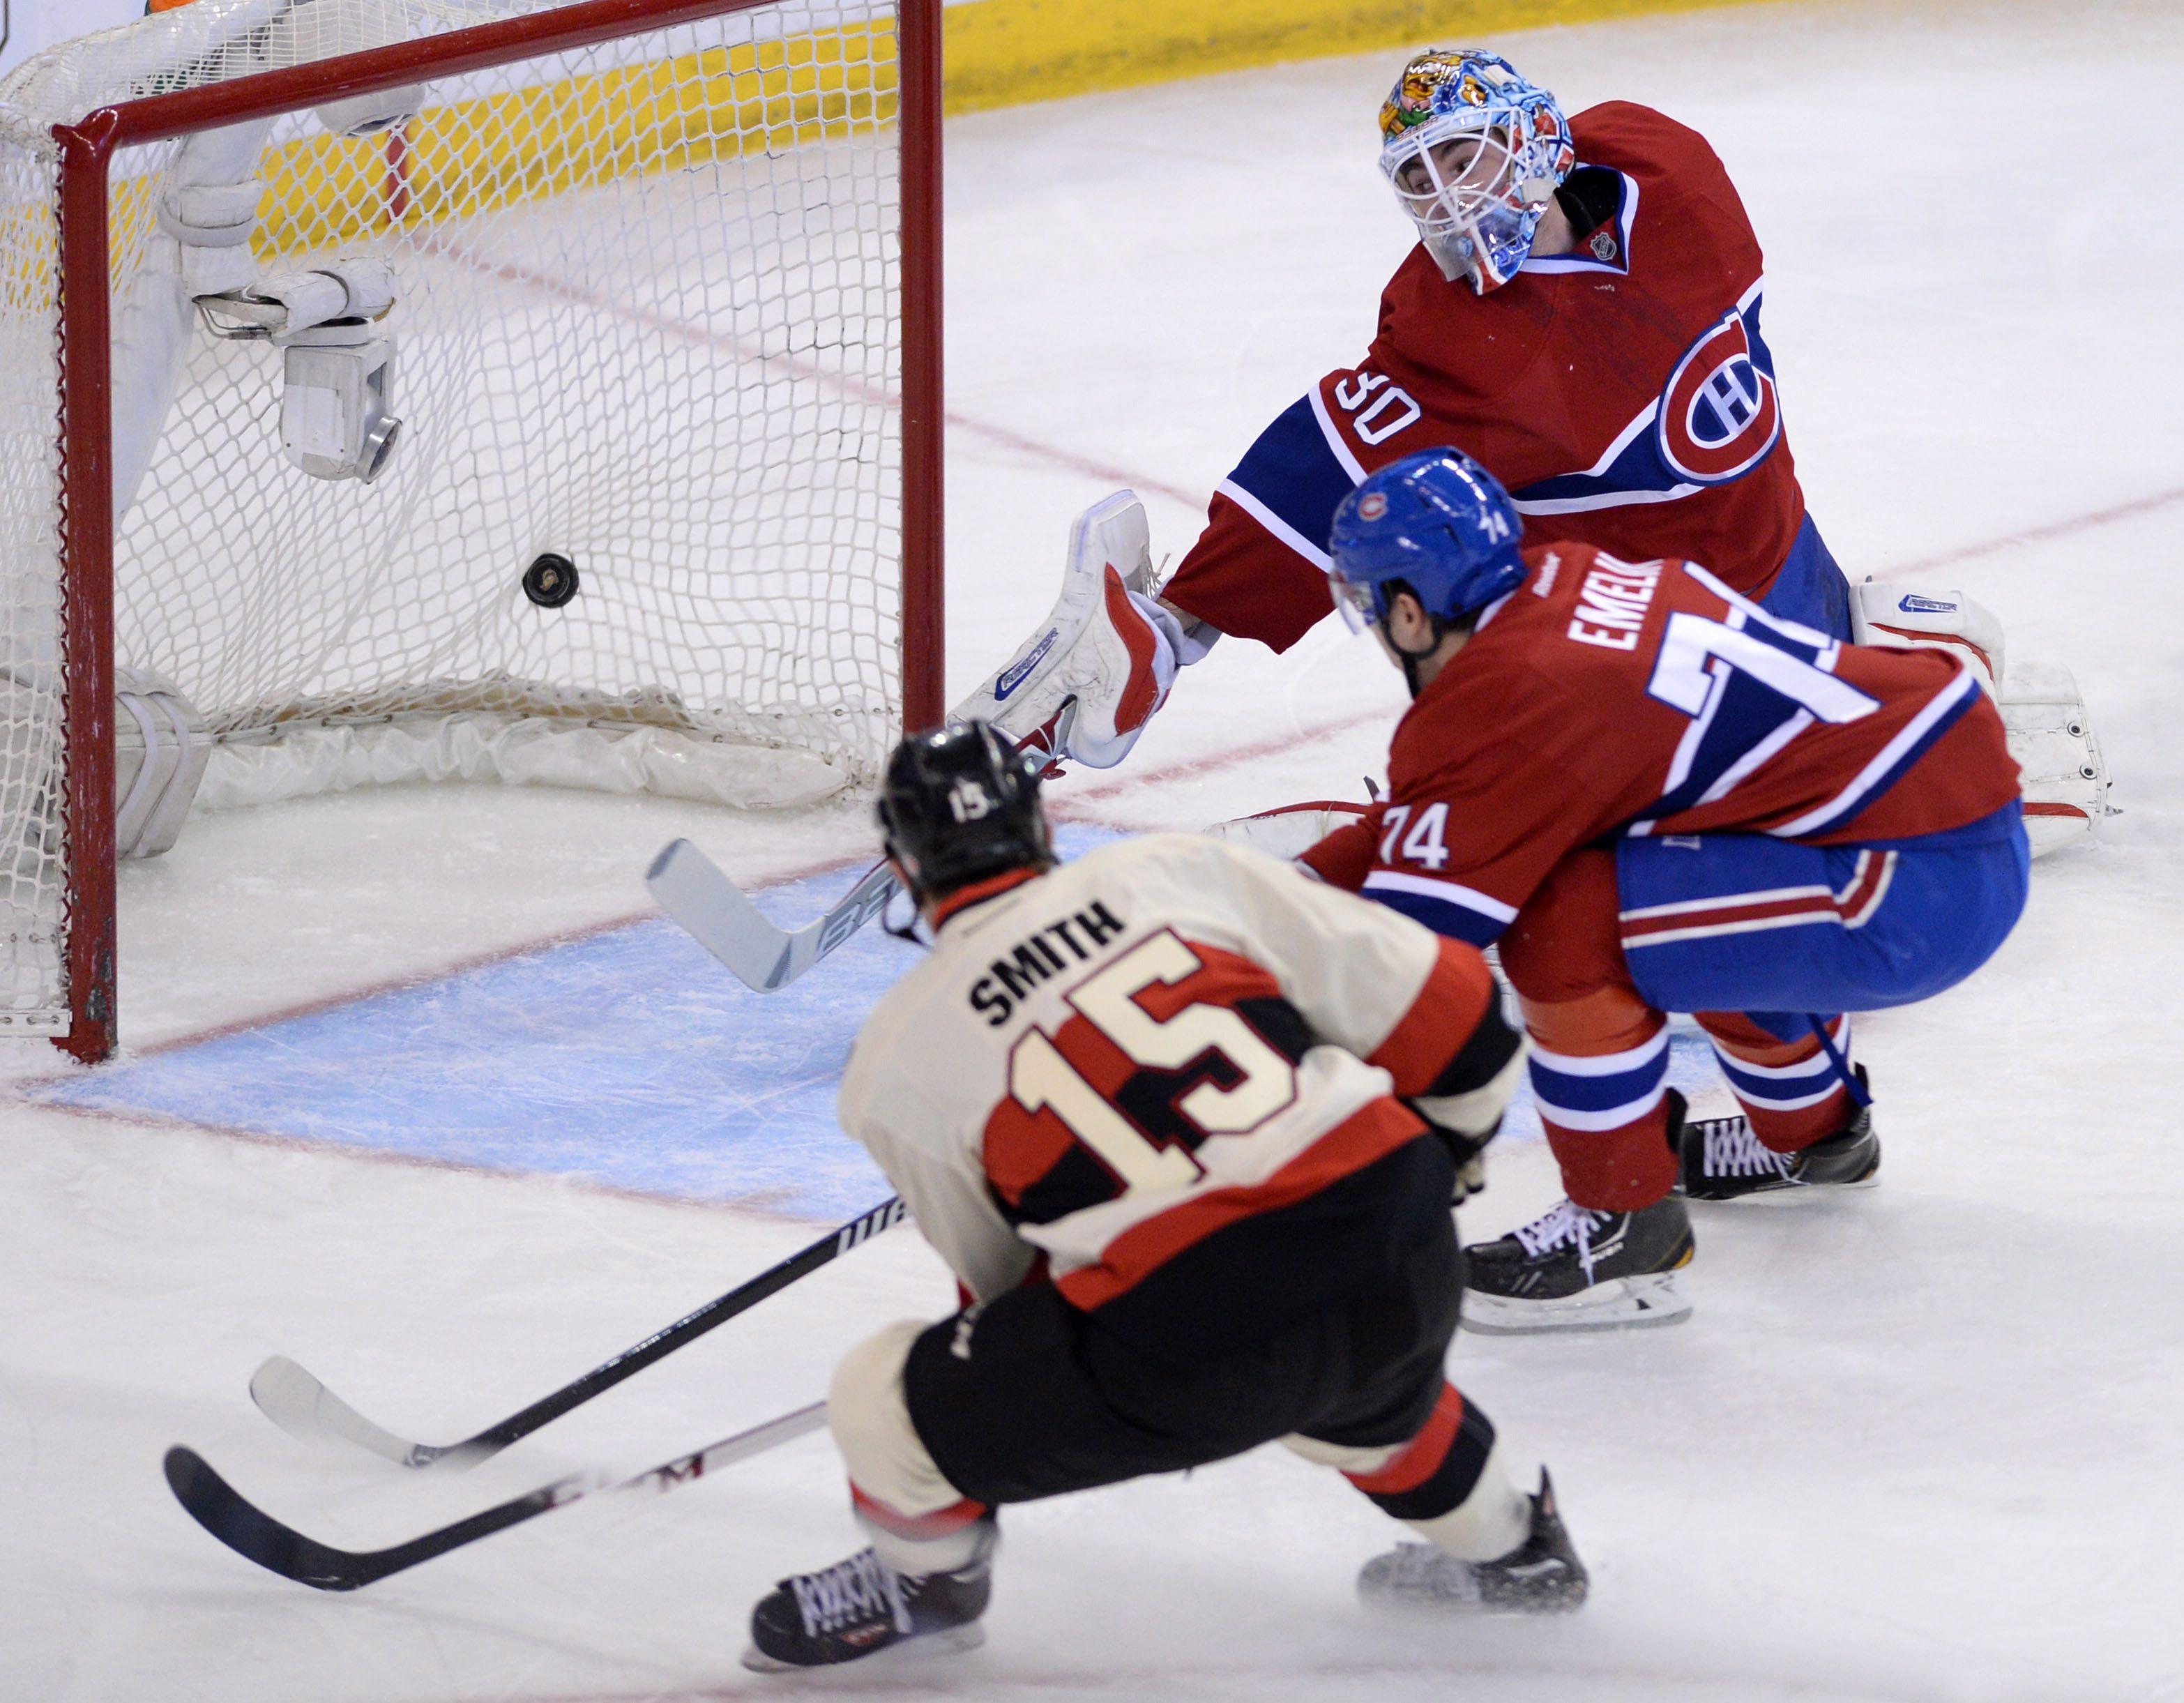 Pacioretty scores 3 as Canadiens beat Senators 7-4